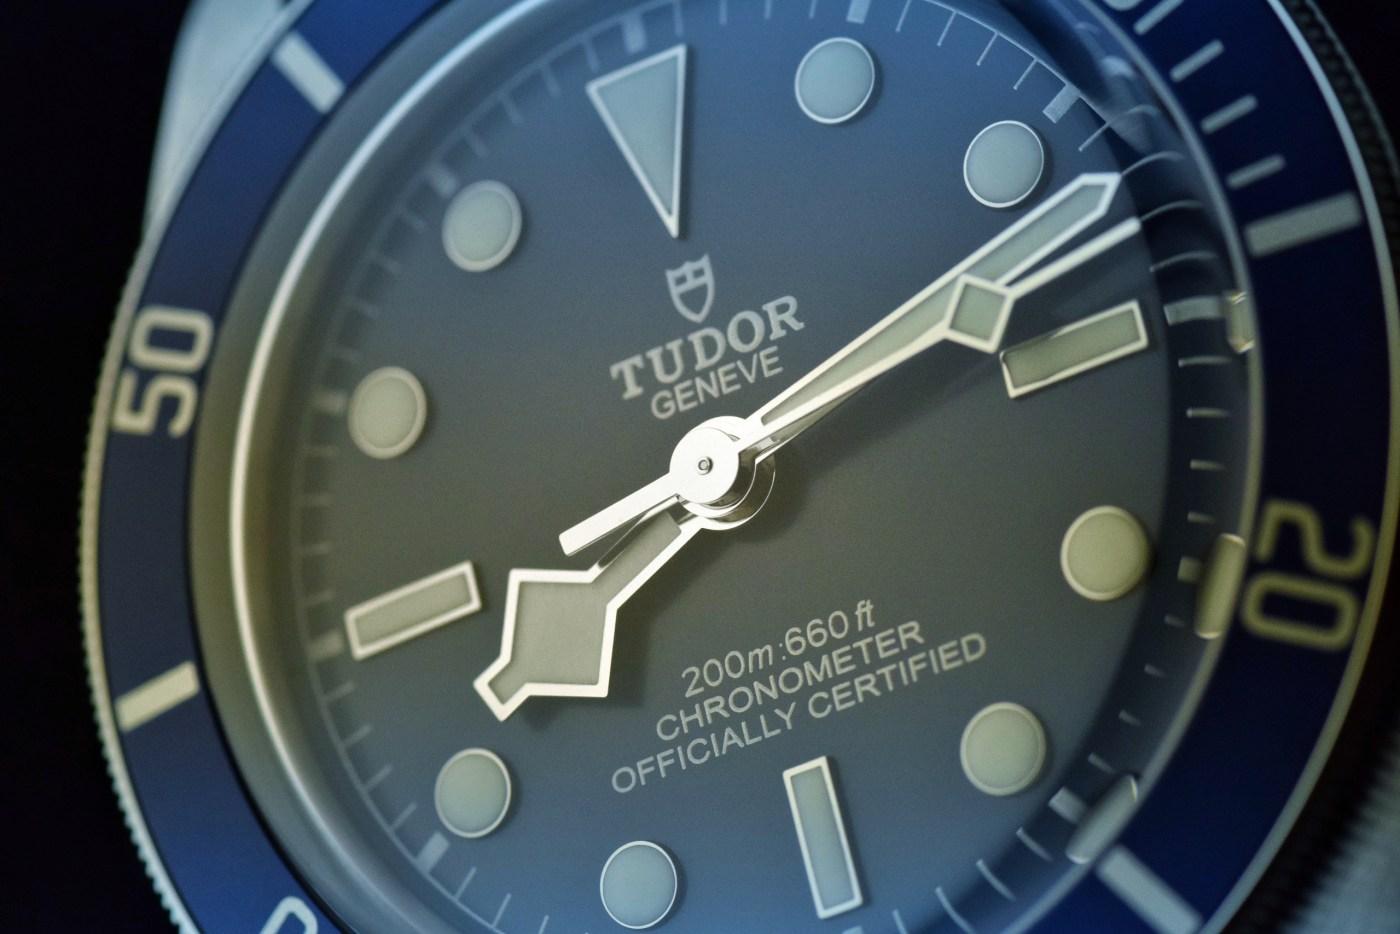 Tudor Black Bay Fifty-Eight Navy Blue Ref. 79030B-0003